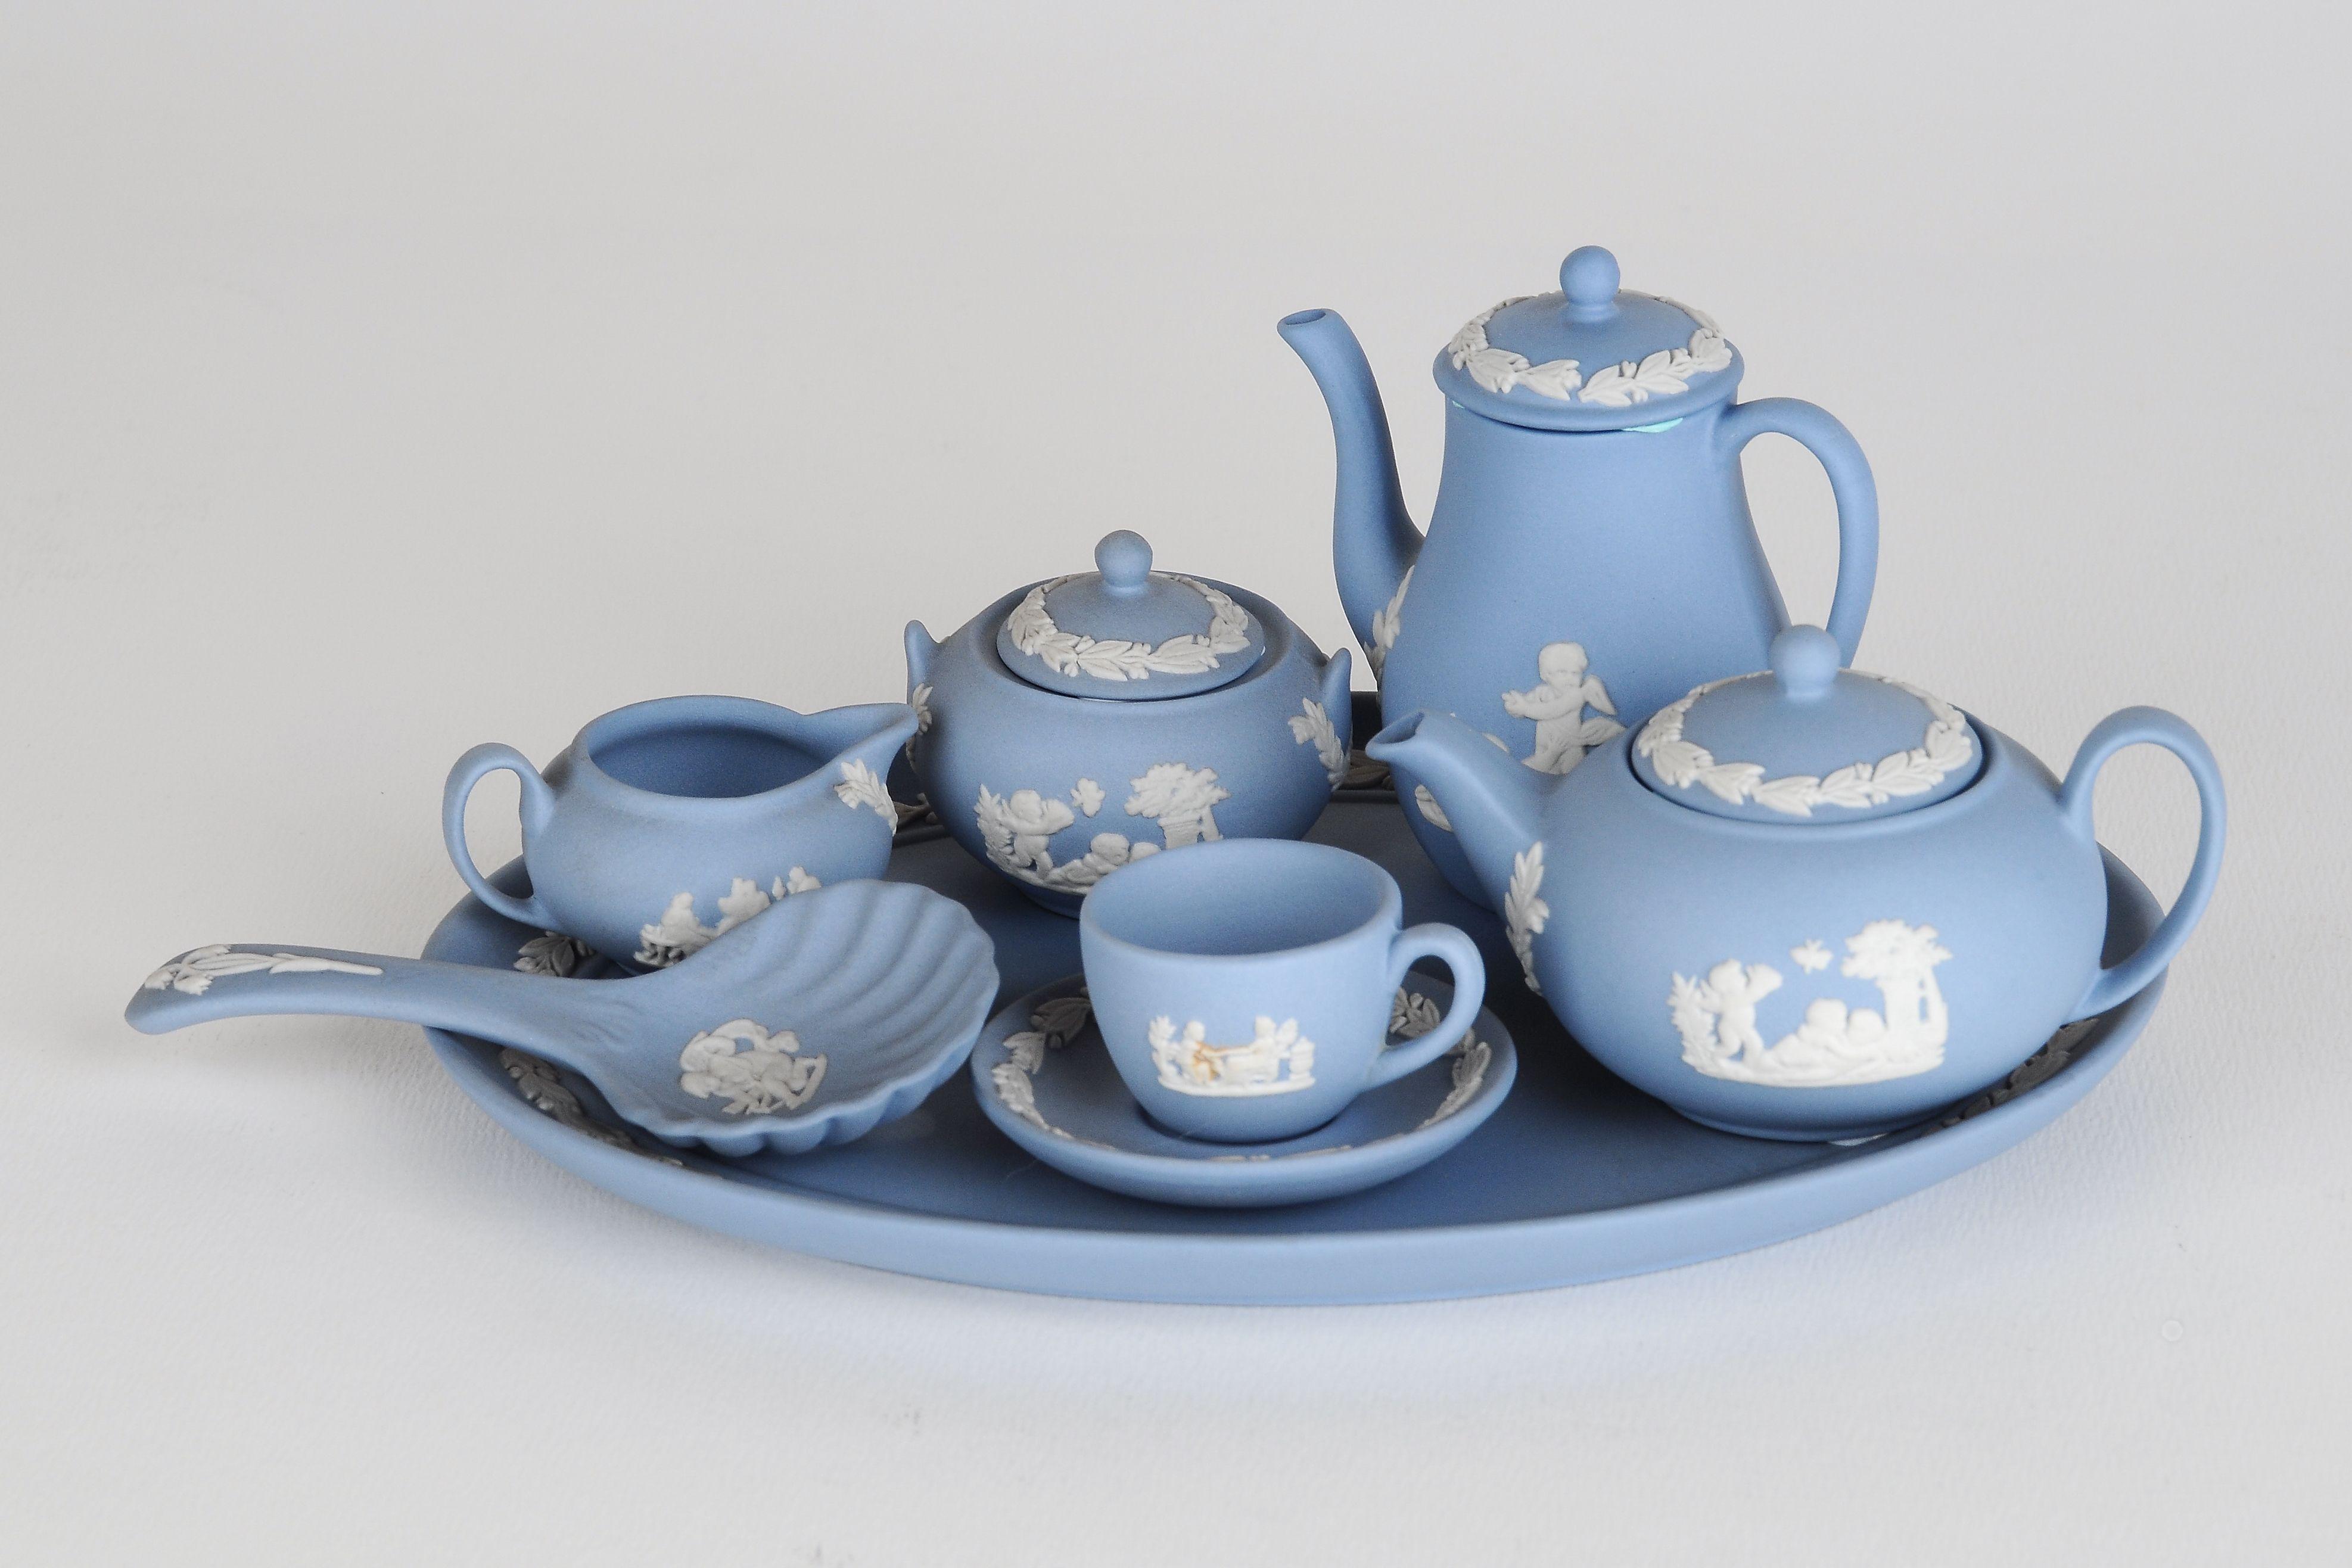 Dollhouse Miniature Tableware Chinaware with Mini Teapots and Miniature Tea Cups